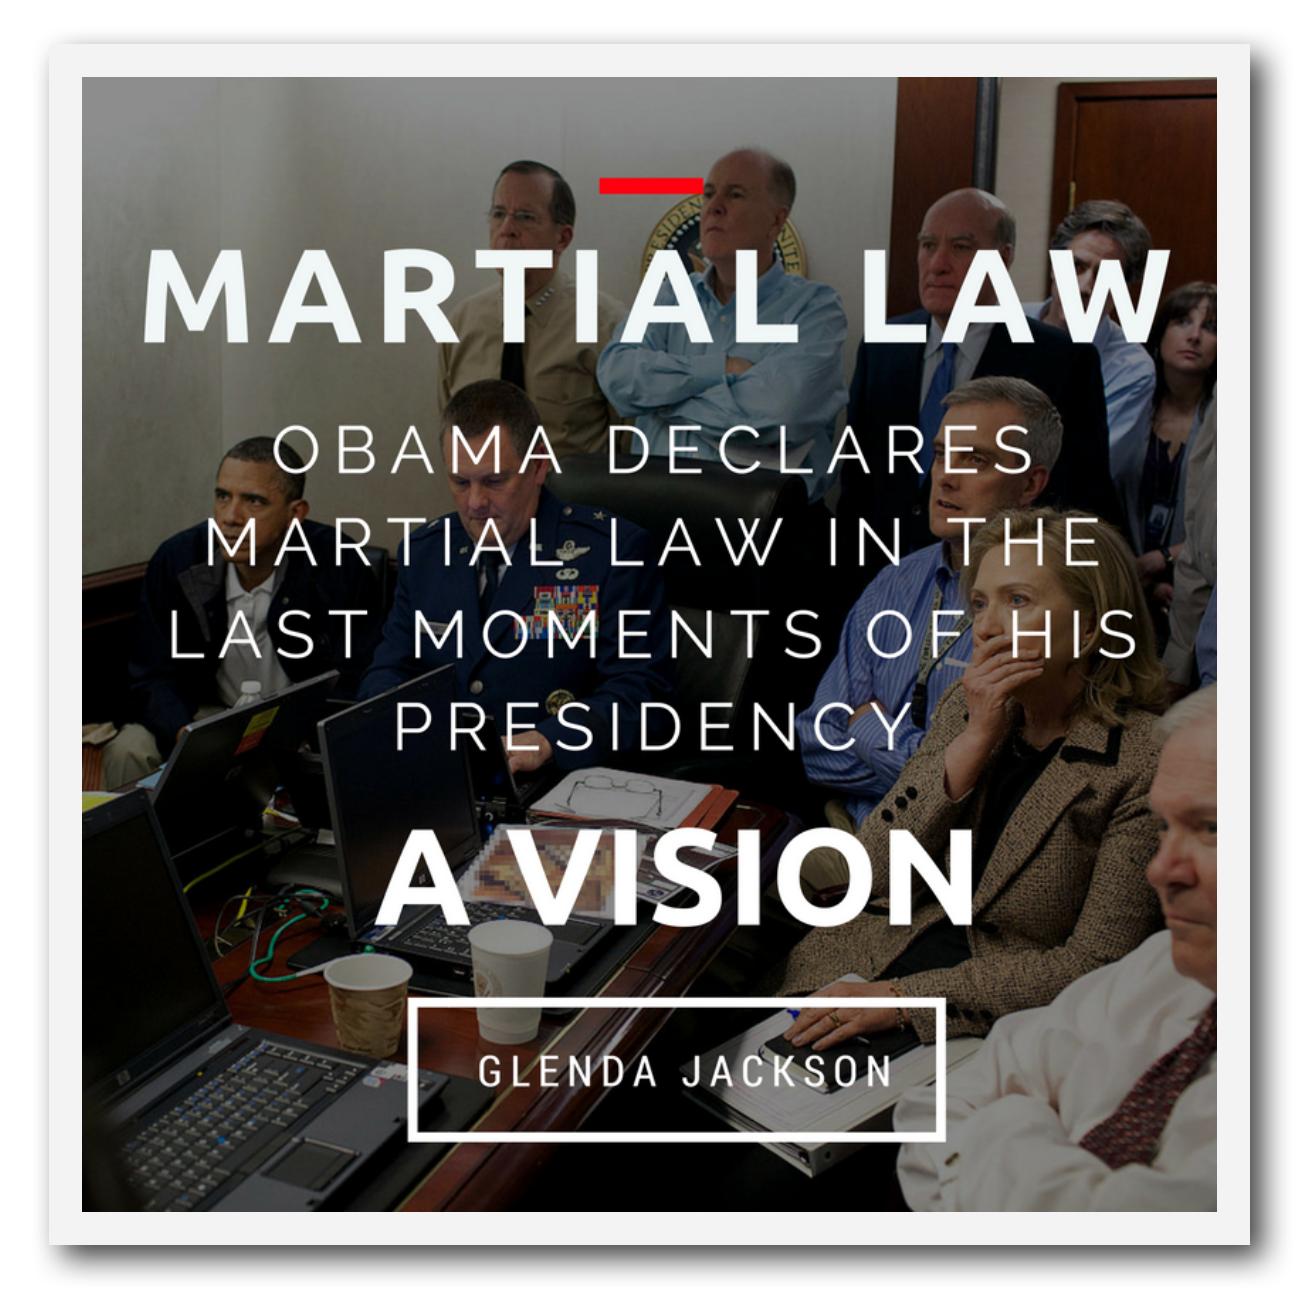 glenda-jackson-vision-of-obama-declaring-martial-law